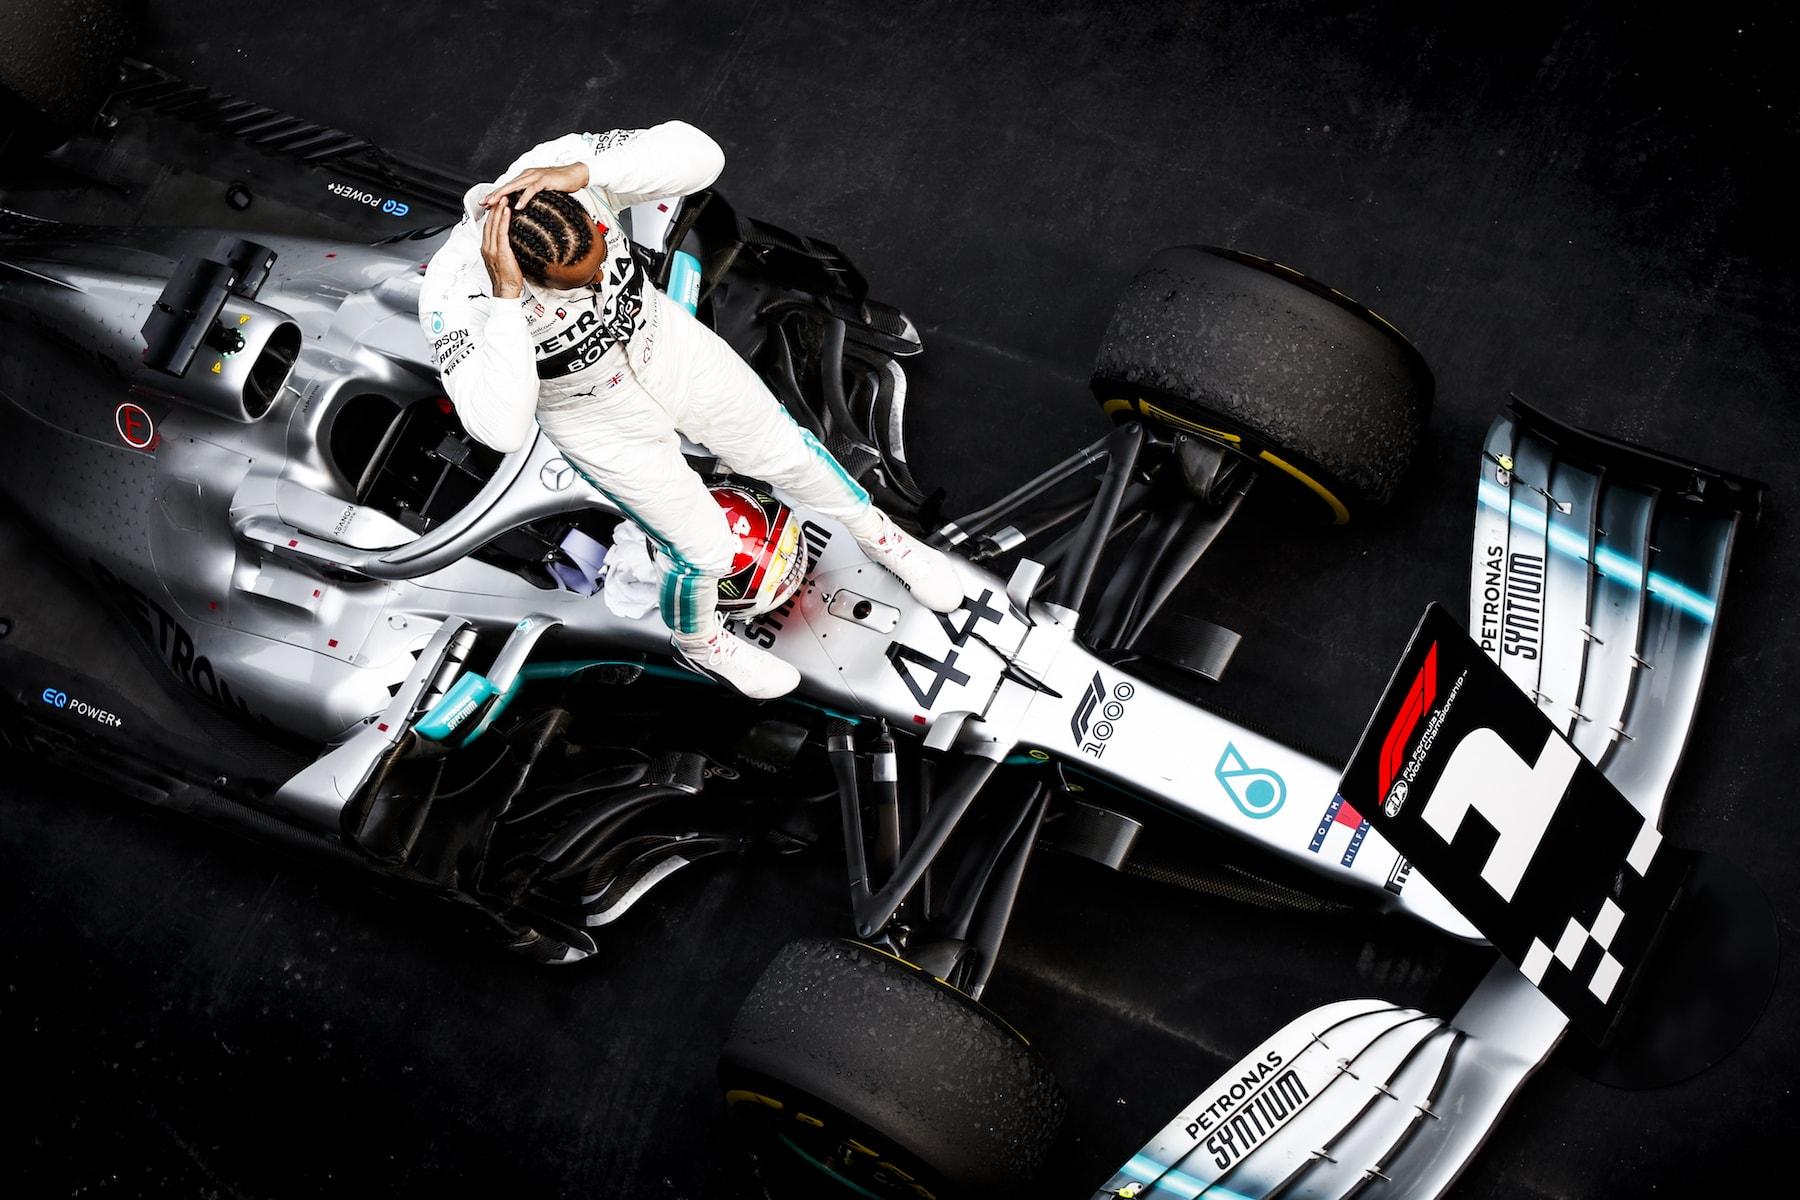 3 2019 Lewis Hamilton | Mercedes W10 | 2019 Chinese GP winner 2 copy.jpg